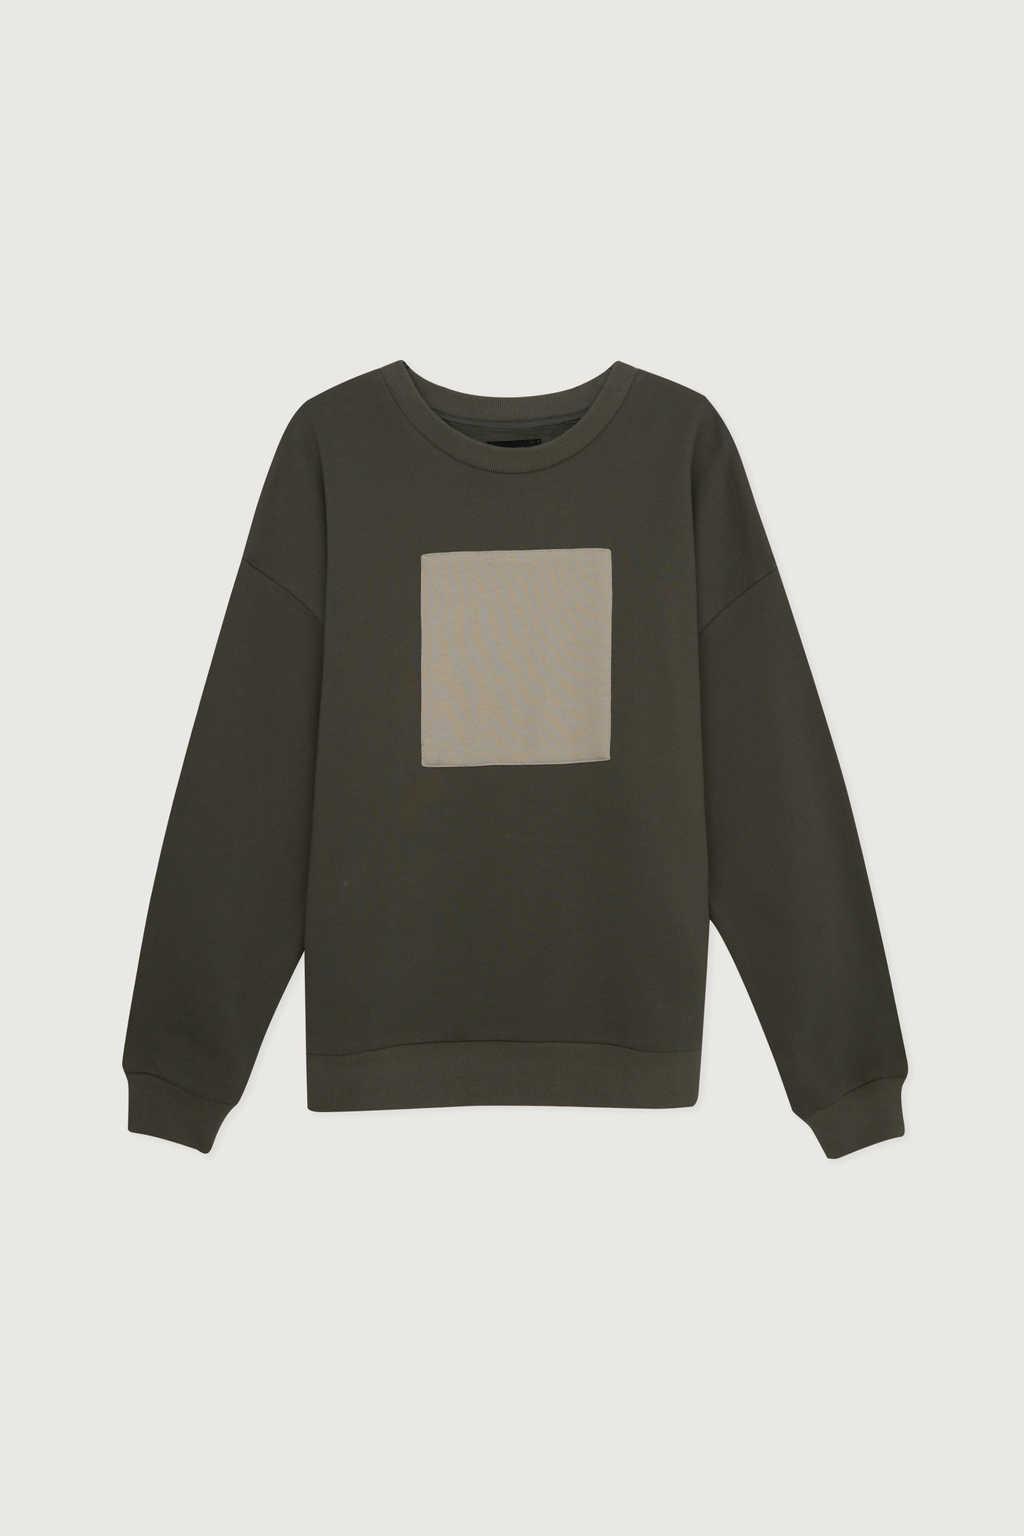 Sweatshirt 3138 Olive 11